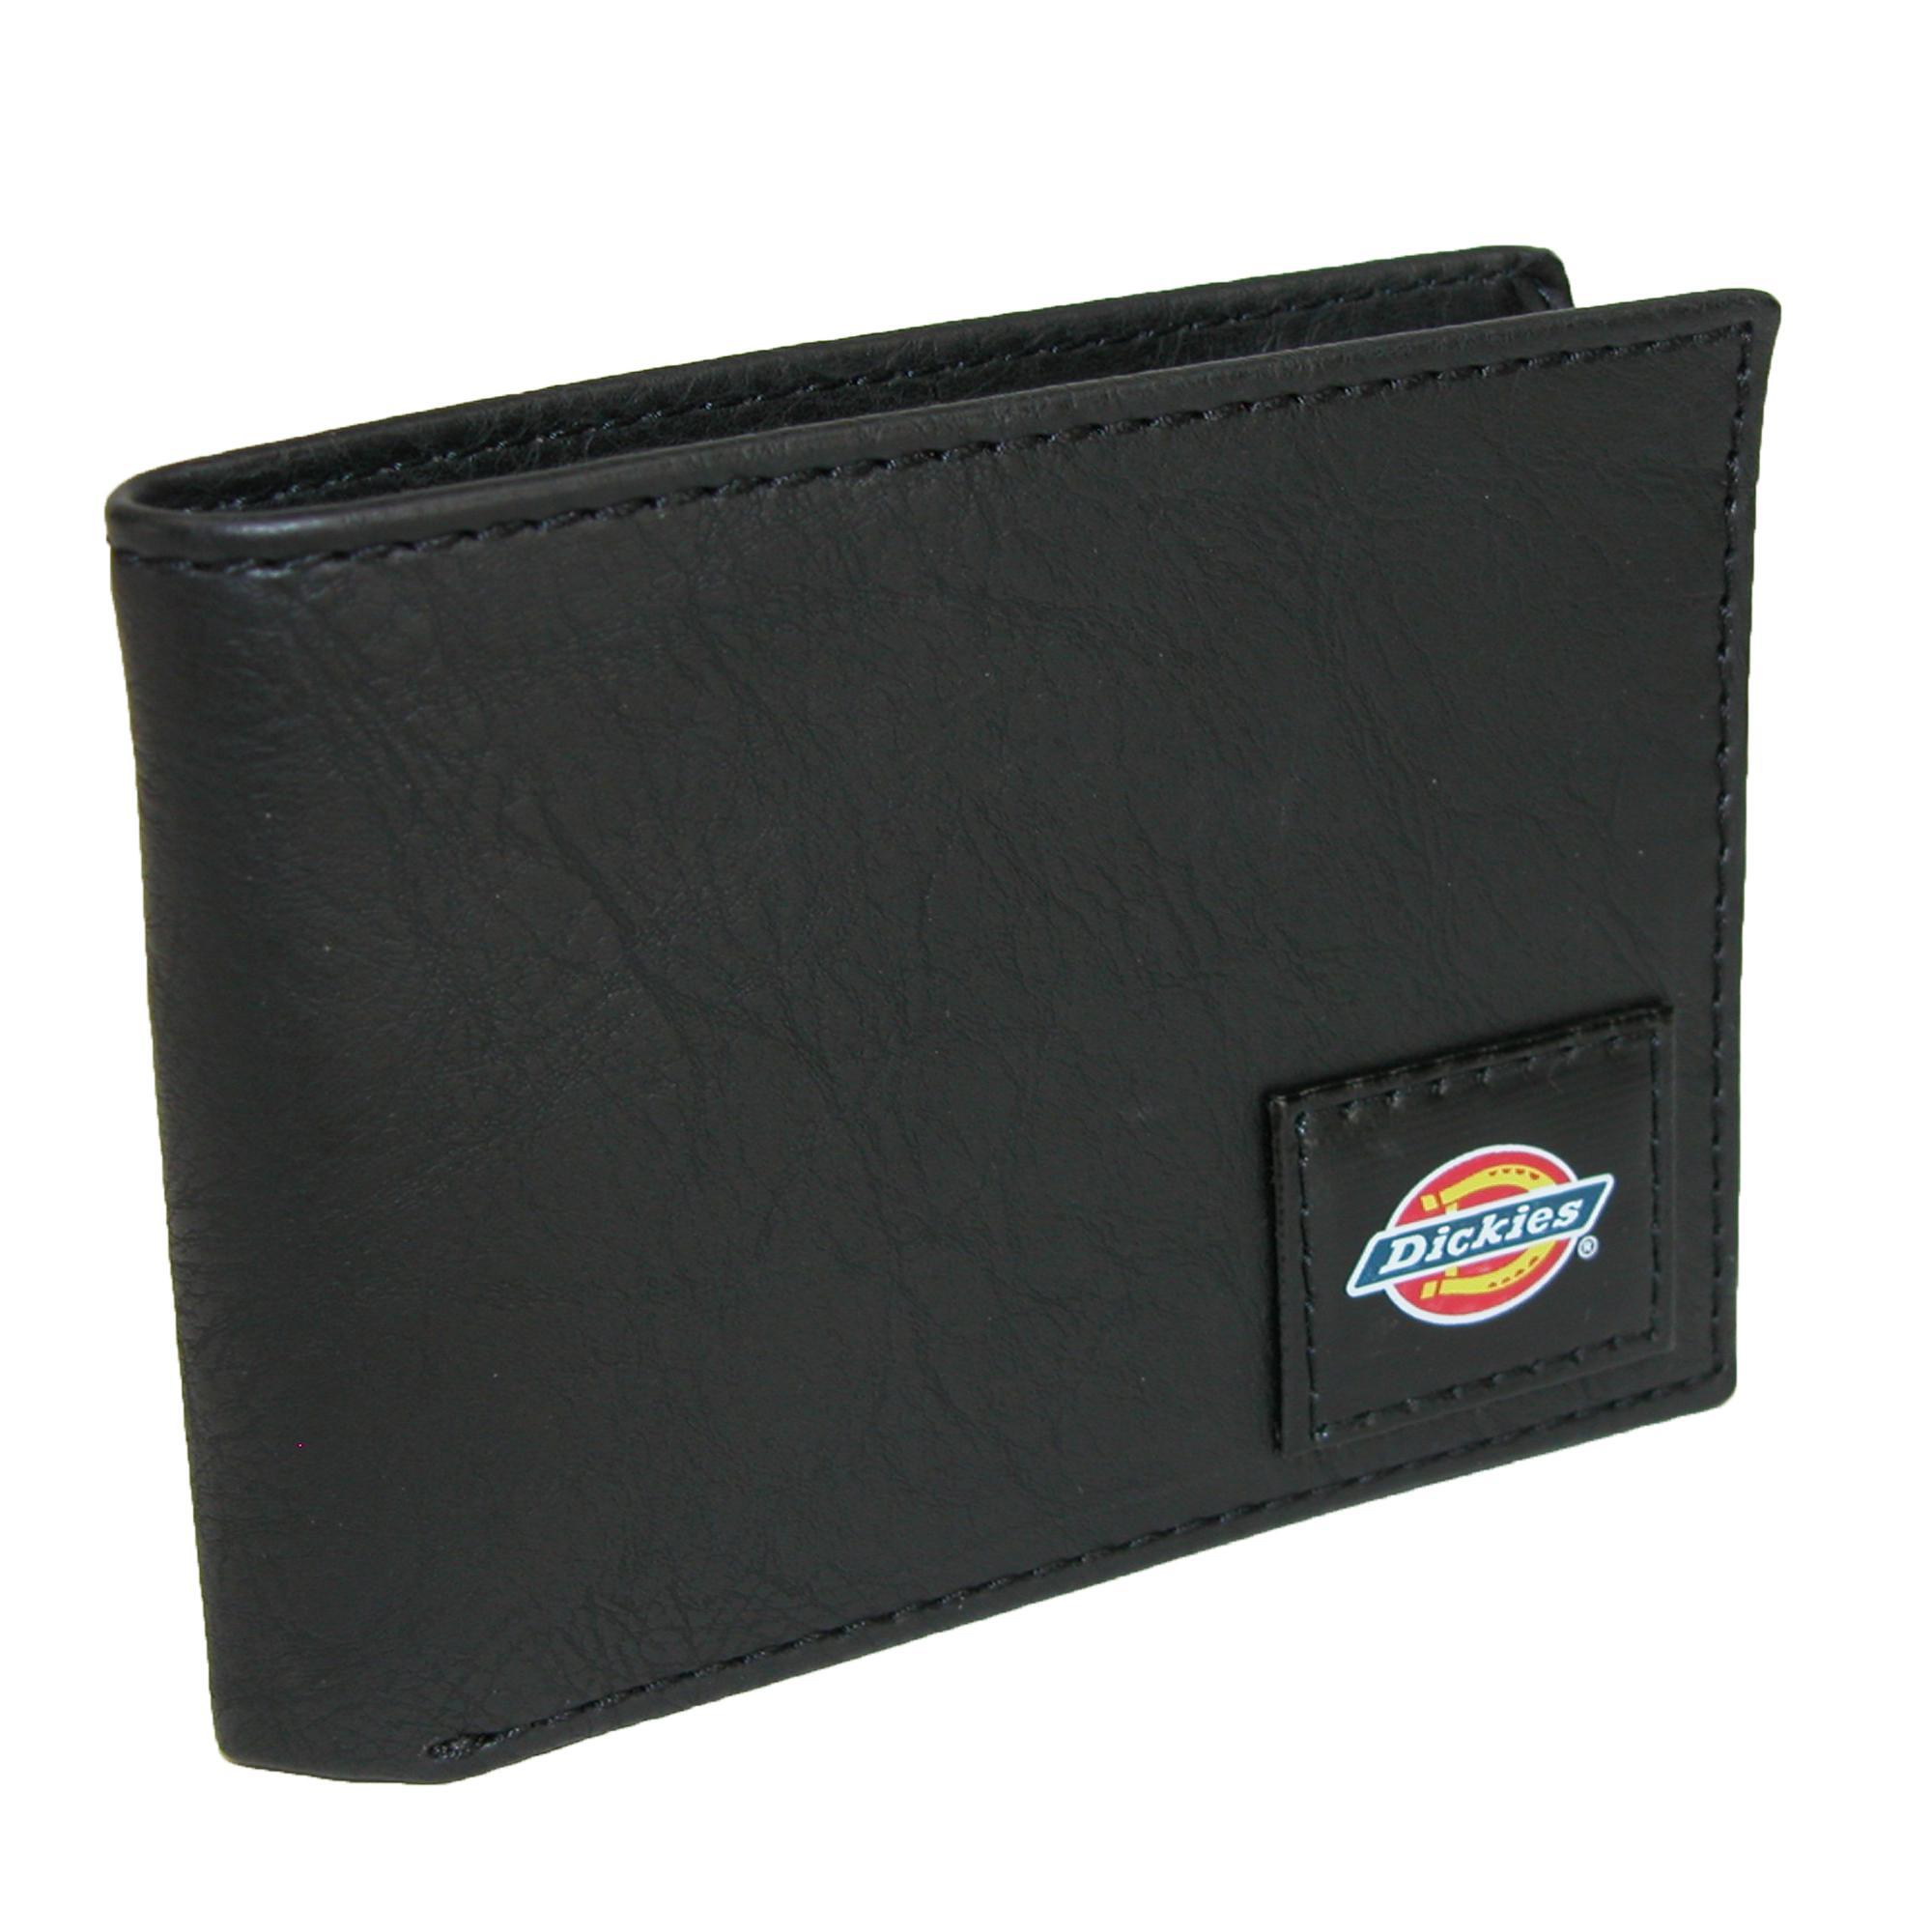 Dickies Men's Leather Slim Basic Bifold Wallet - image 4 de 4